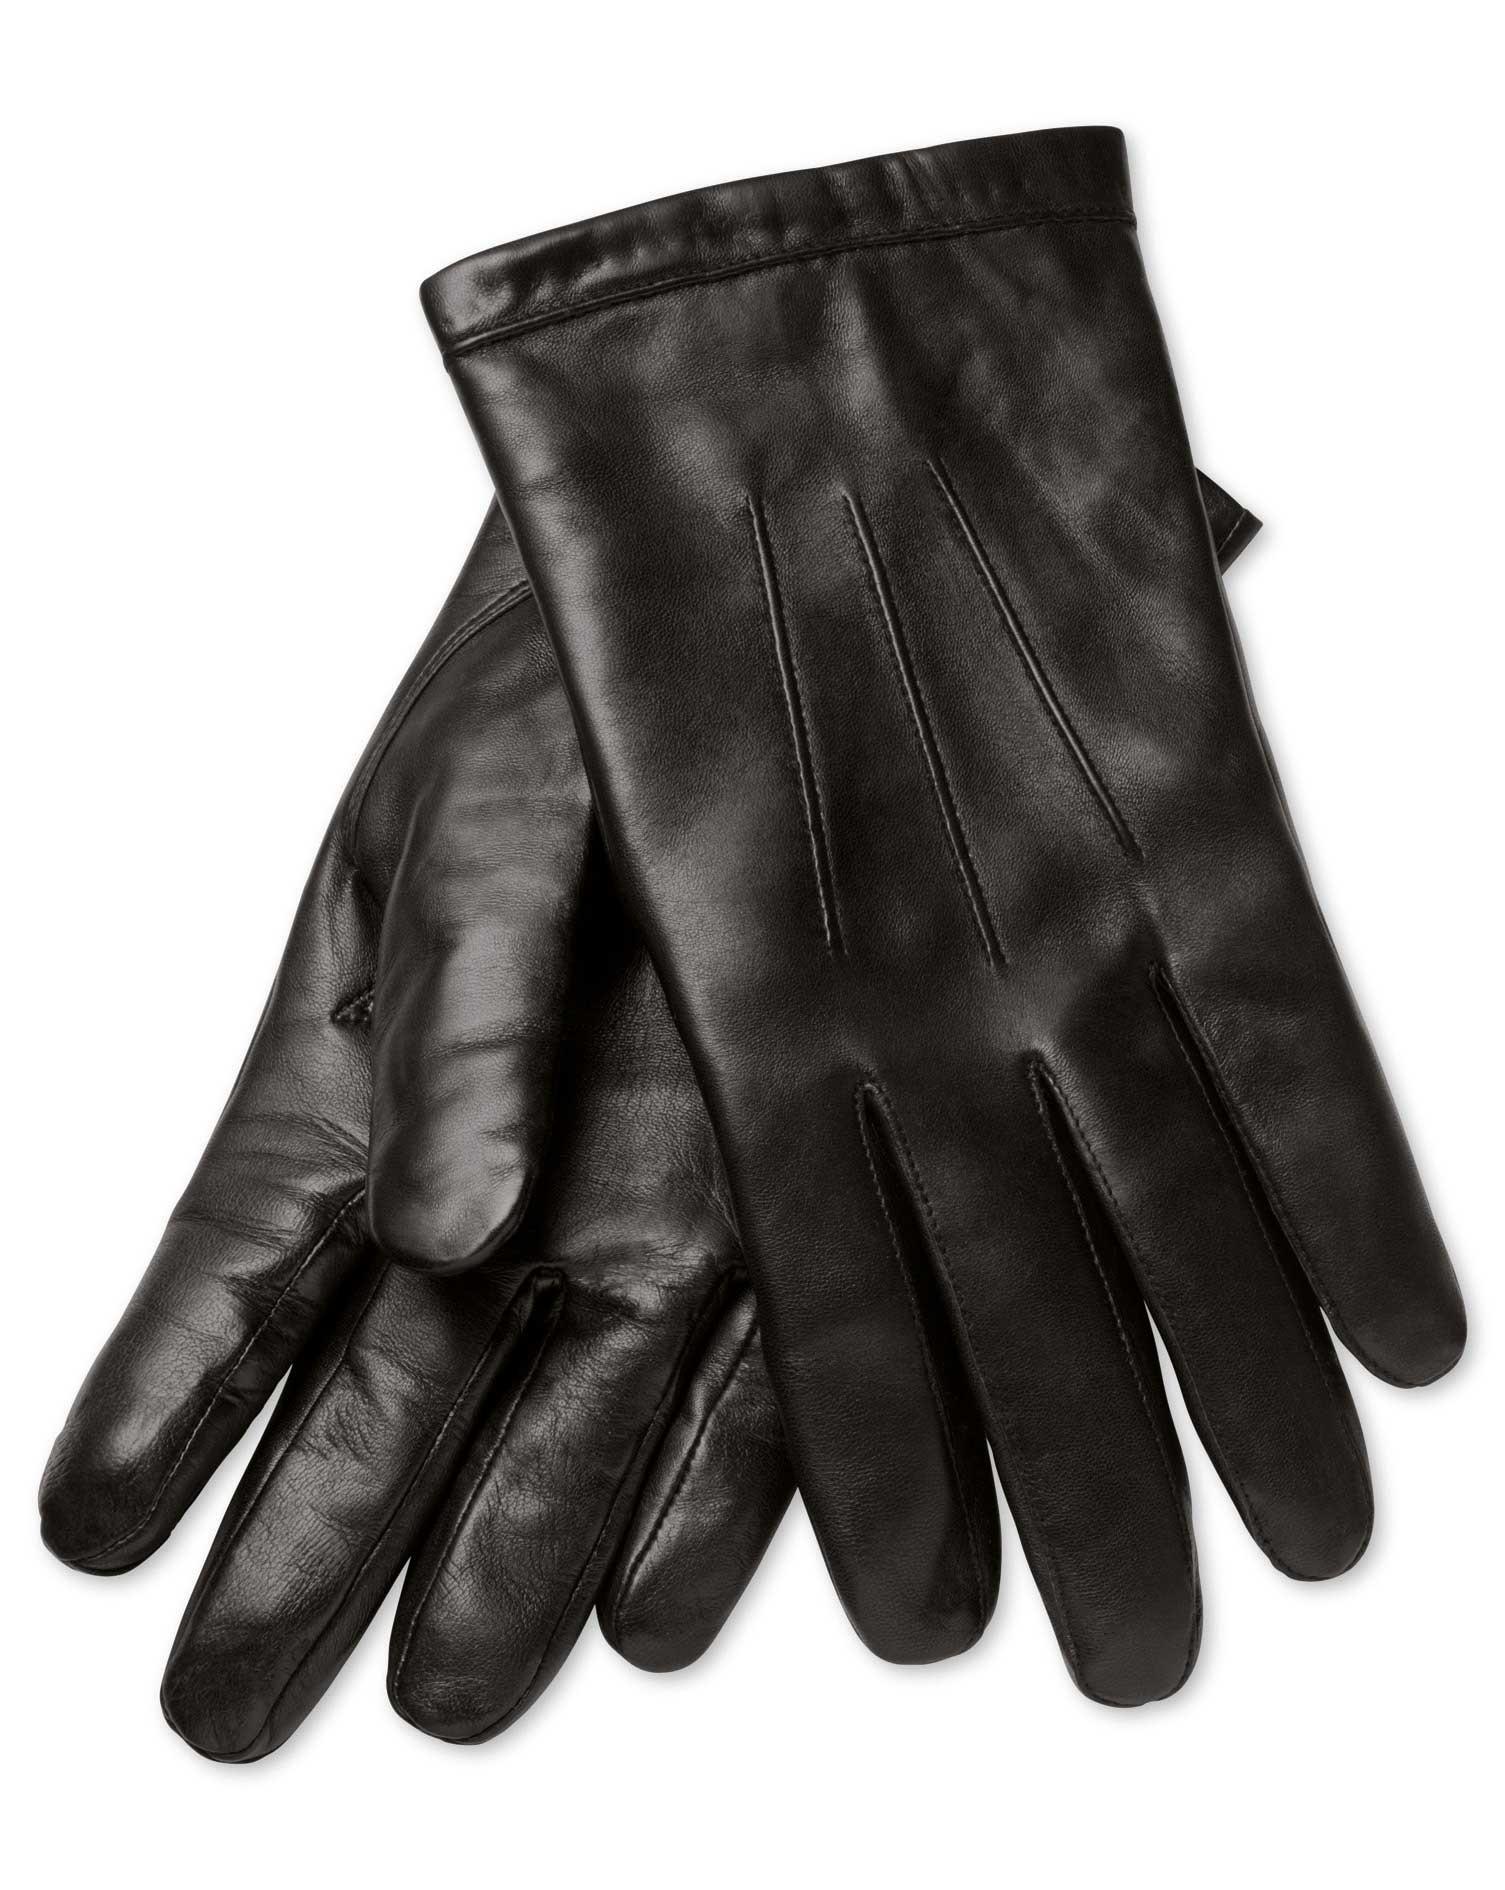 Black Leather Gloves Size Medium by Charles Tyrwhitt